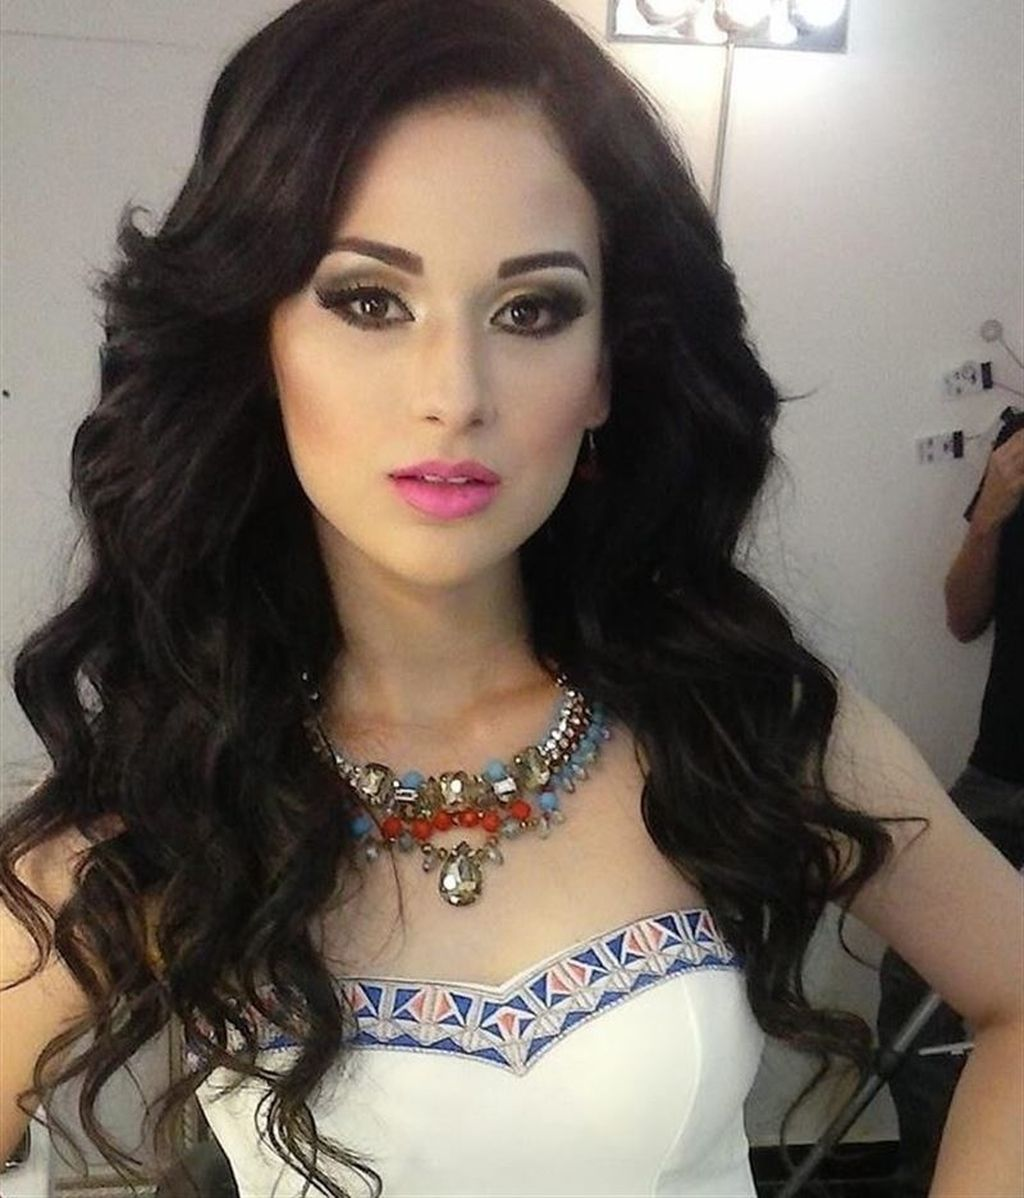 Encuentran muerta de un tiro en la cabeza a la modelo mexicana Alma Pérez